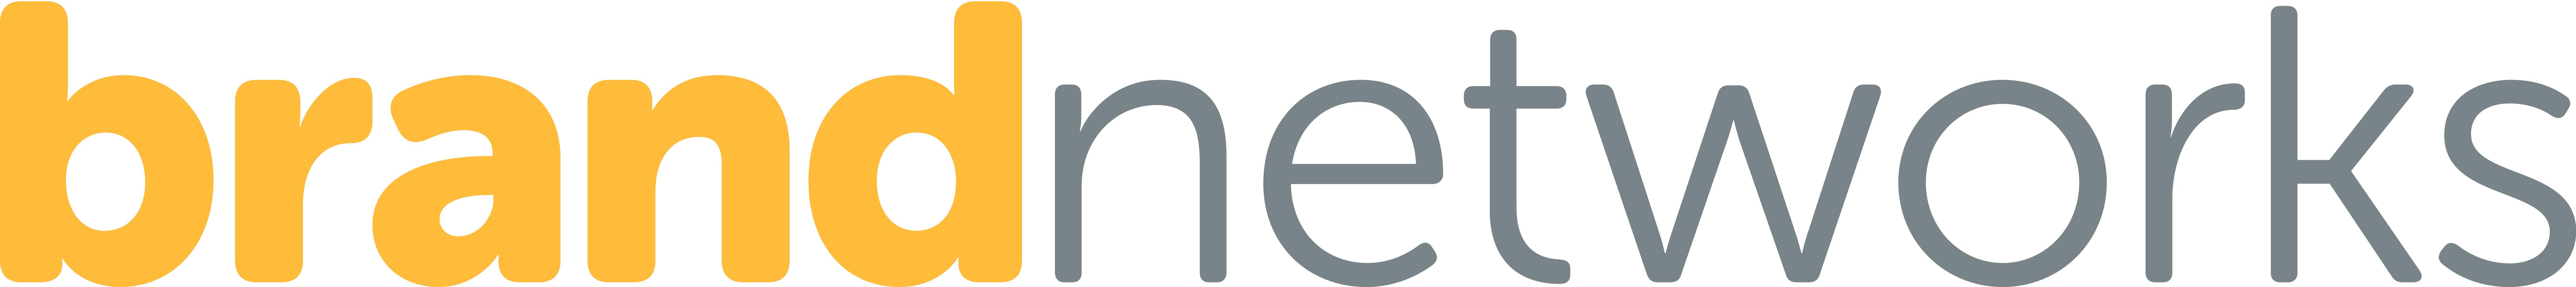 Brand Networks company logo